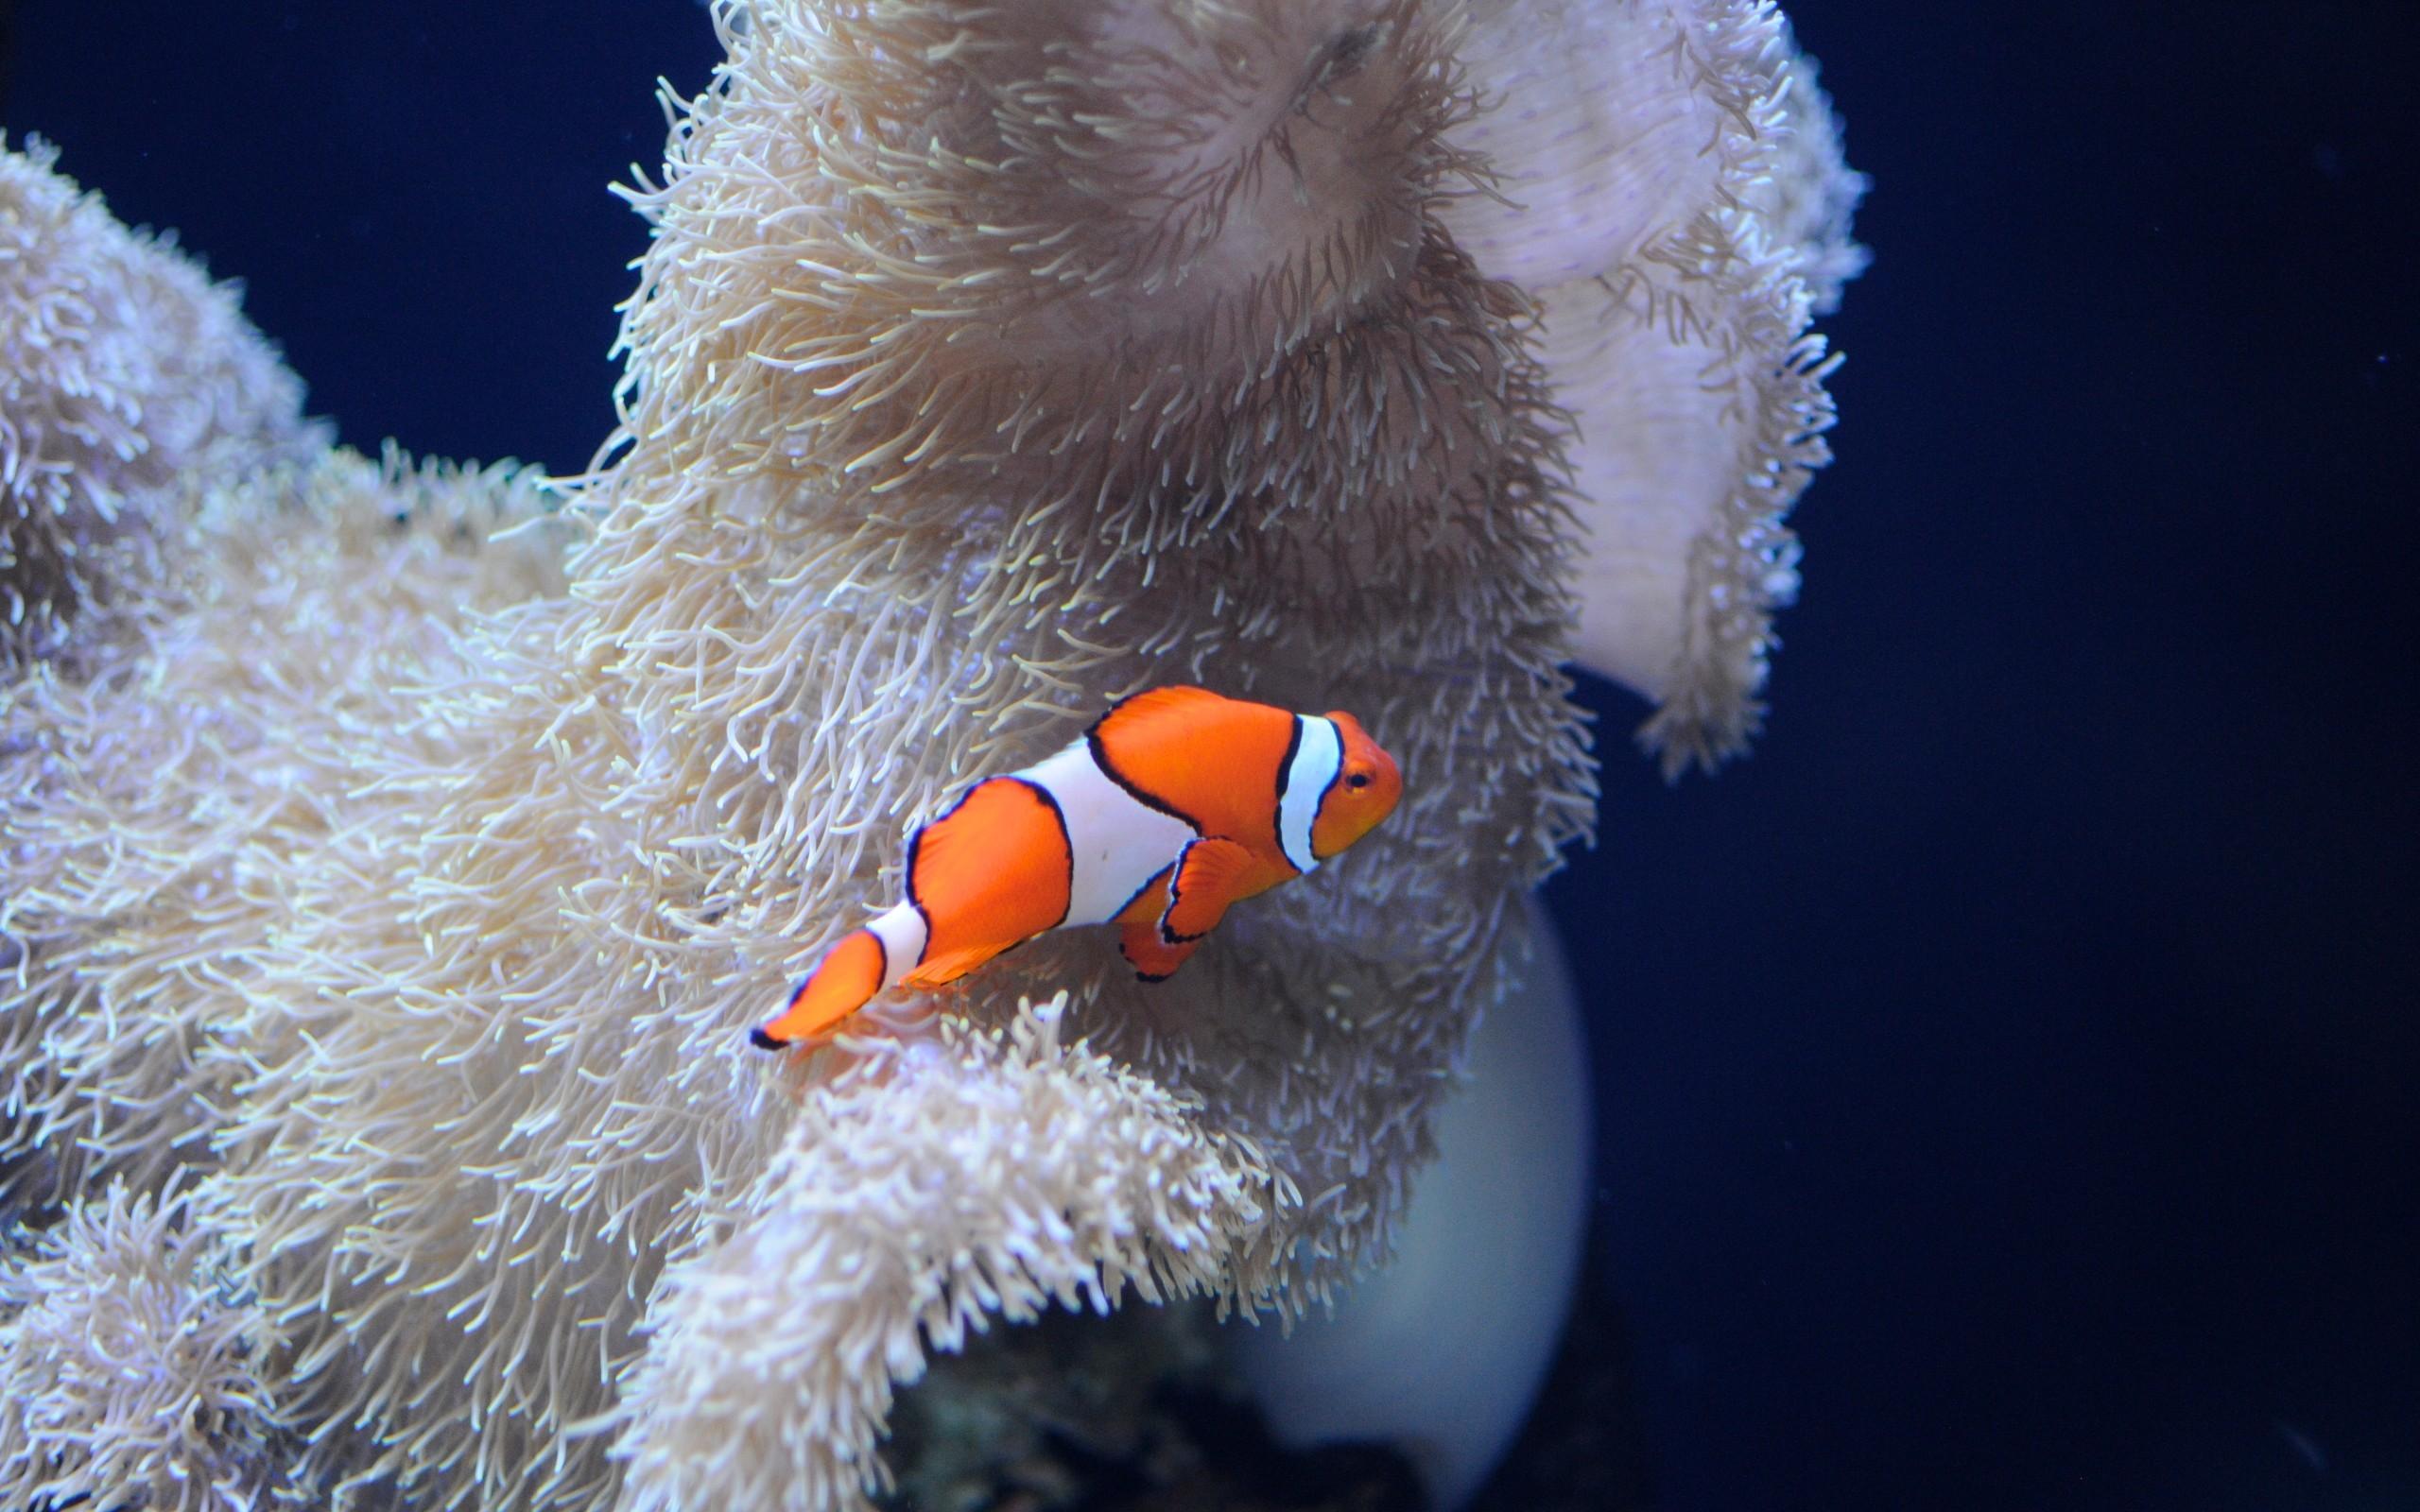 Clown Fish Wallpaper Iphone 6 Plus Clown Fish Wallpaper 183 ①